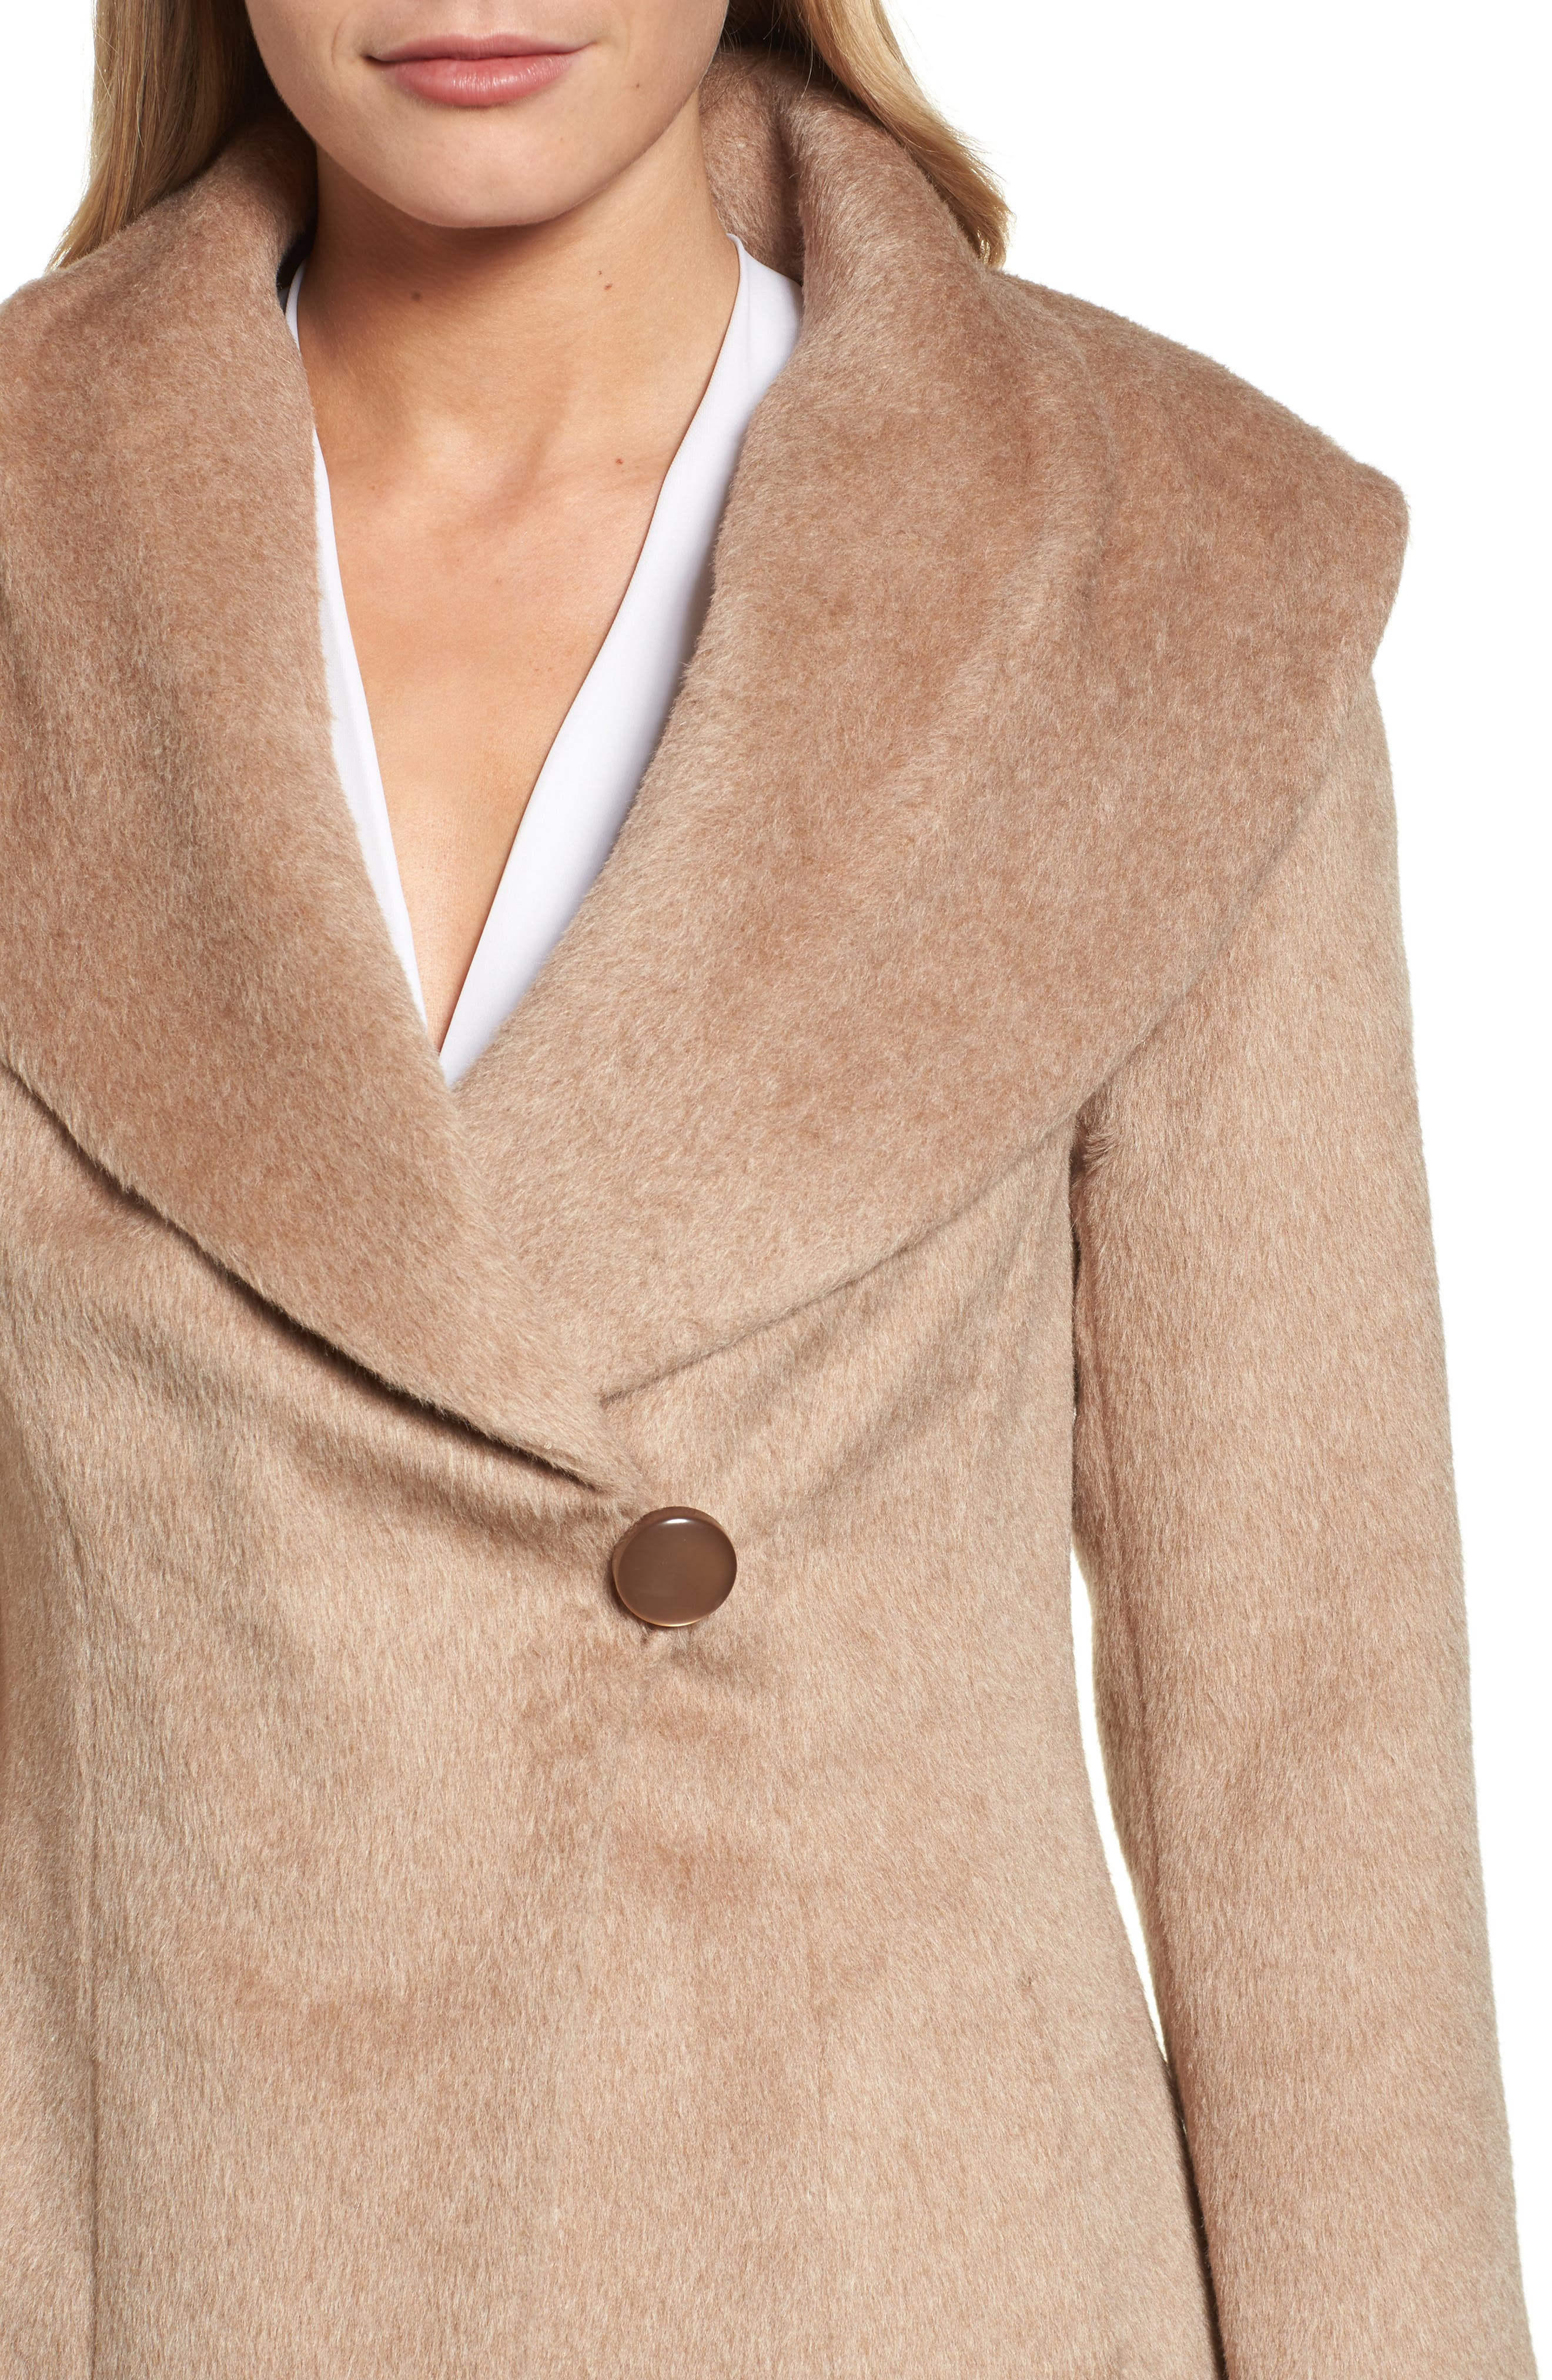 Jemma Shawl Collar Coat,                             Alternate thumbnail 4, color,                             255